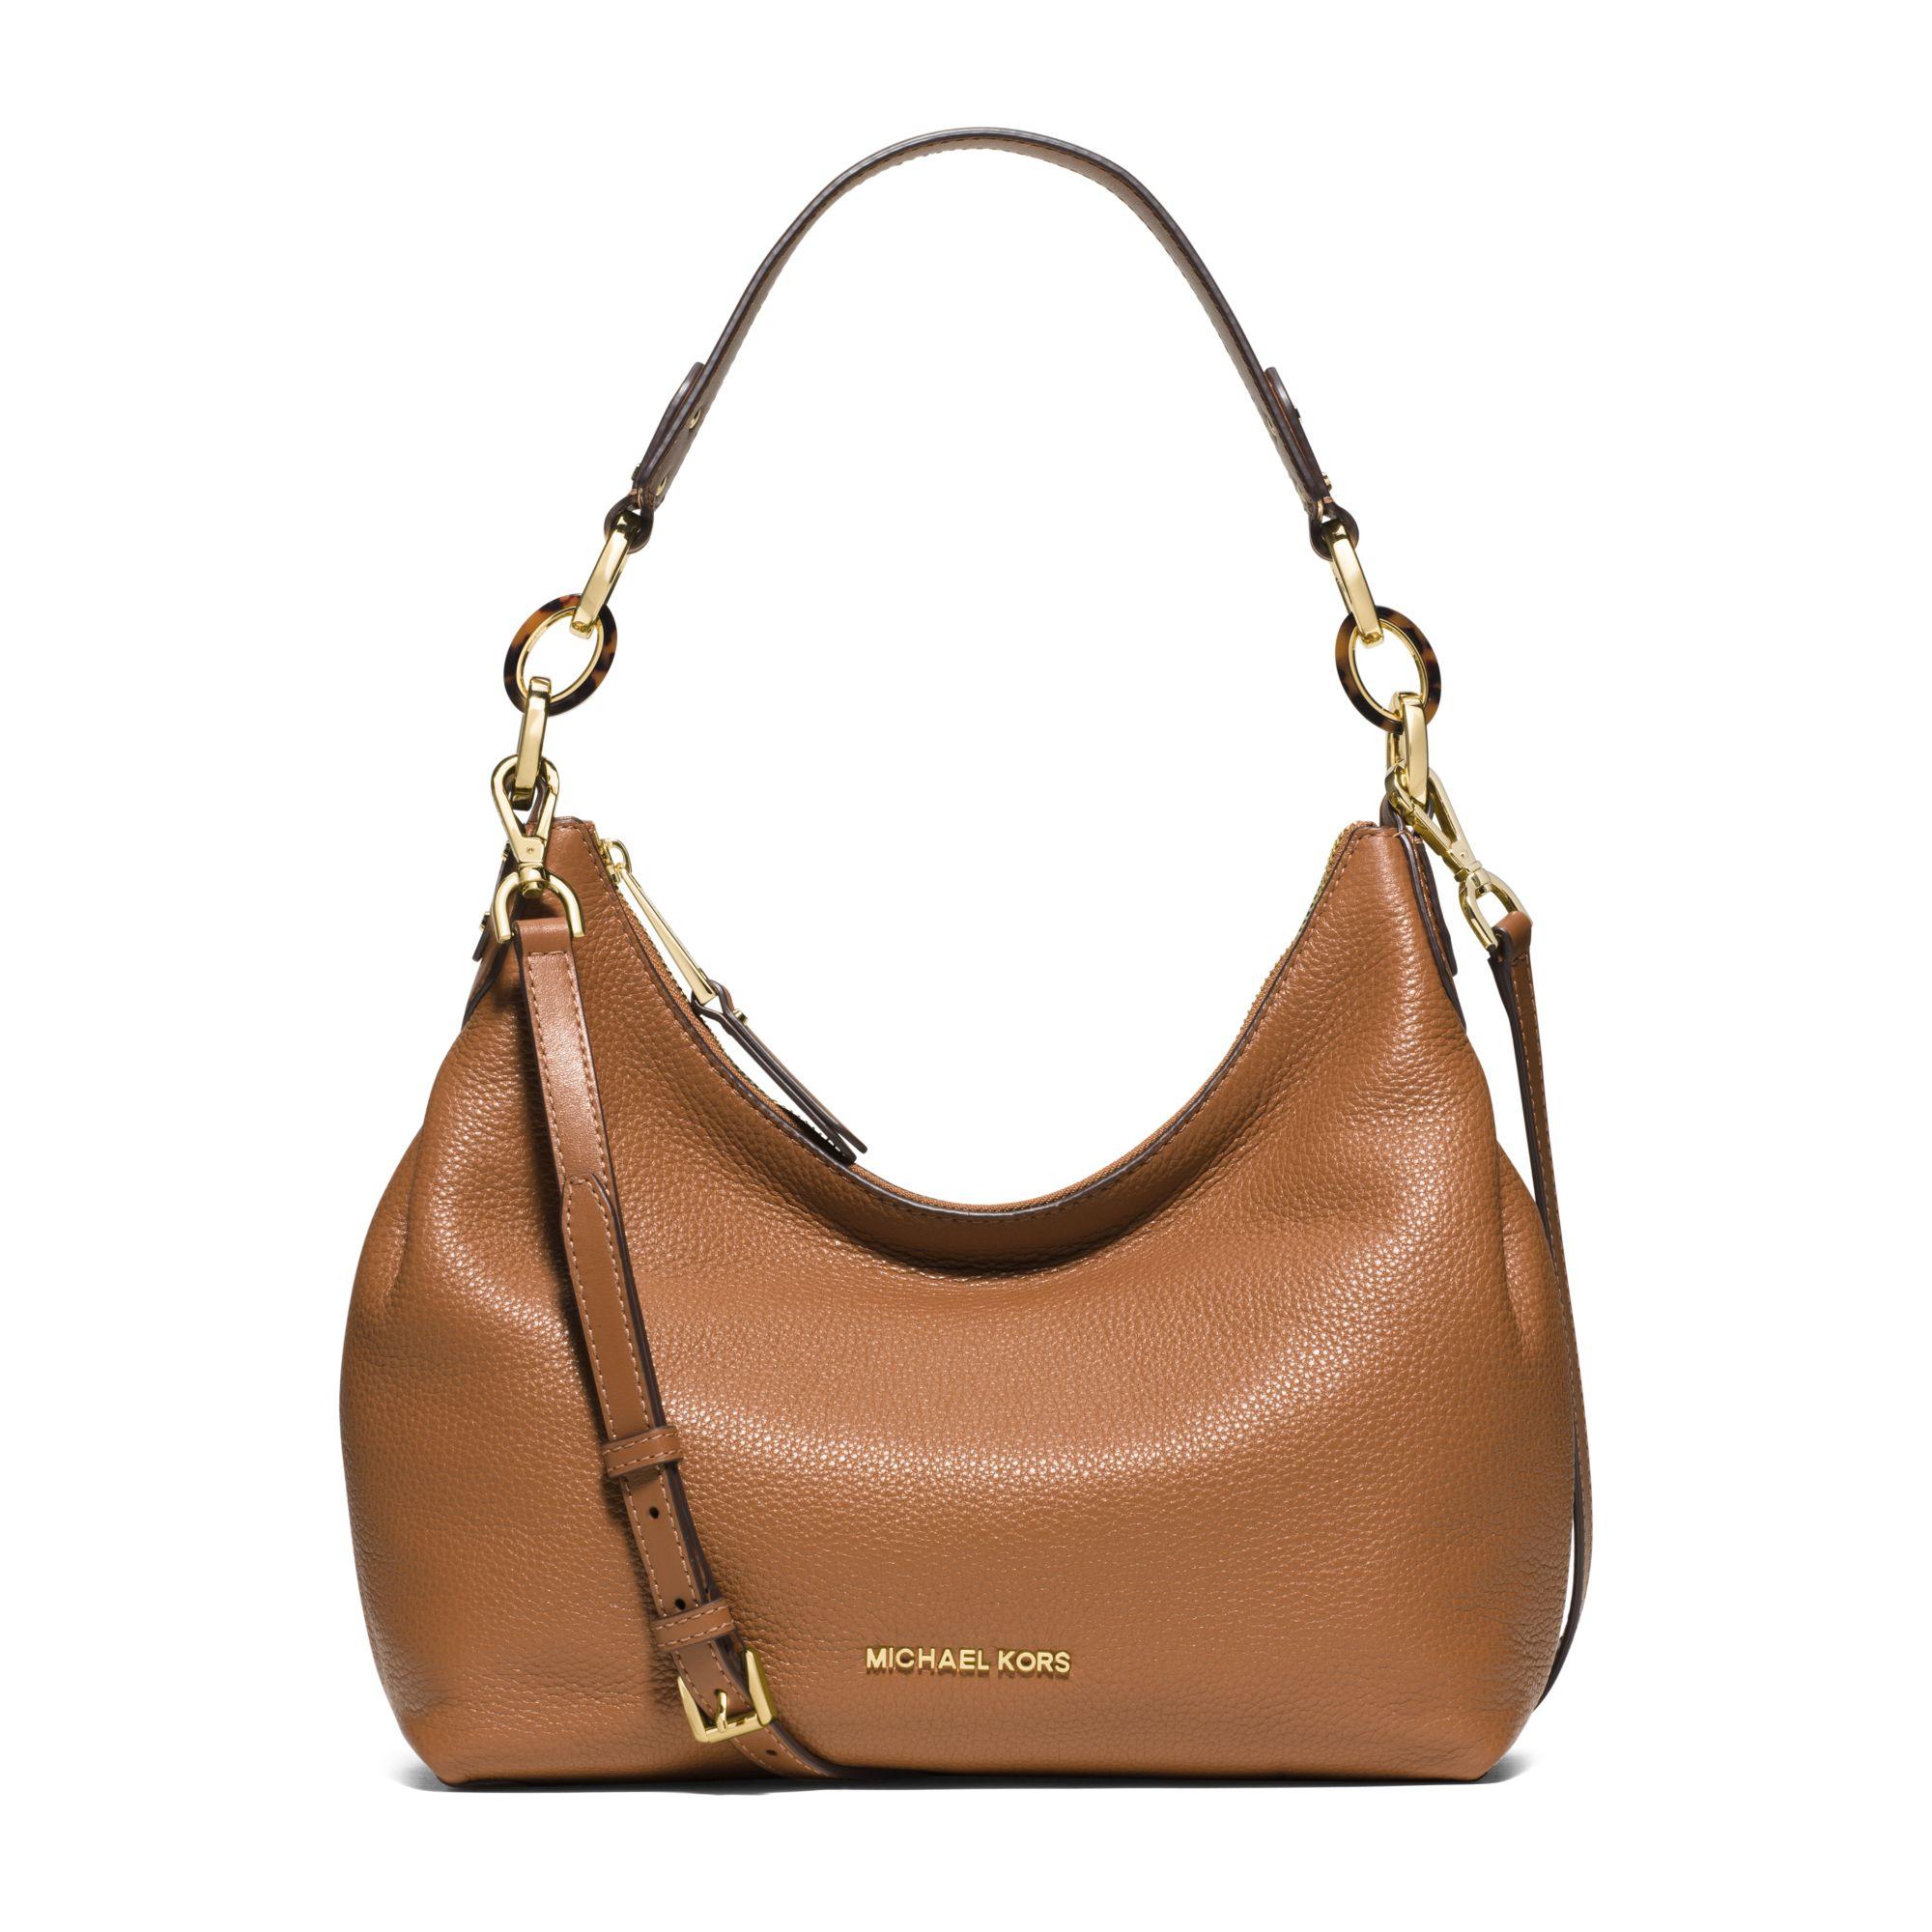 402249256f96 ... canada lyst michael kors isabella medium leather shoulder bag in brown  2b938 a8d89